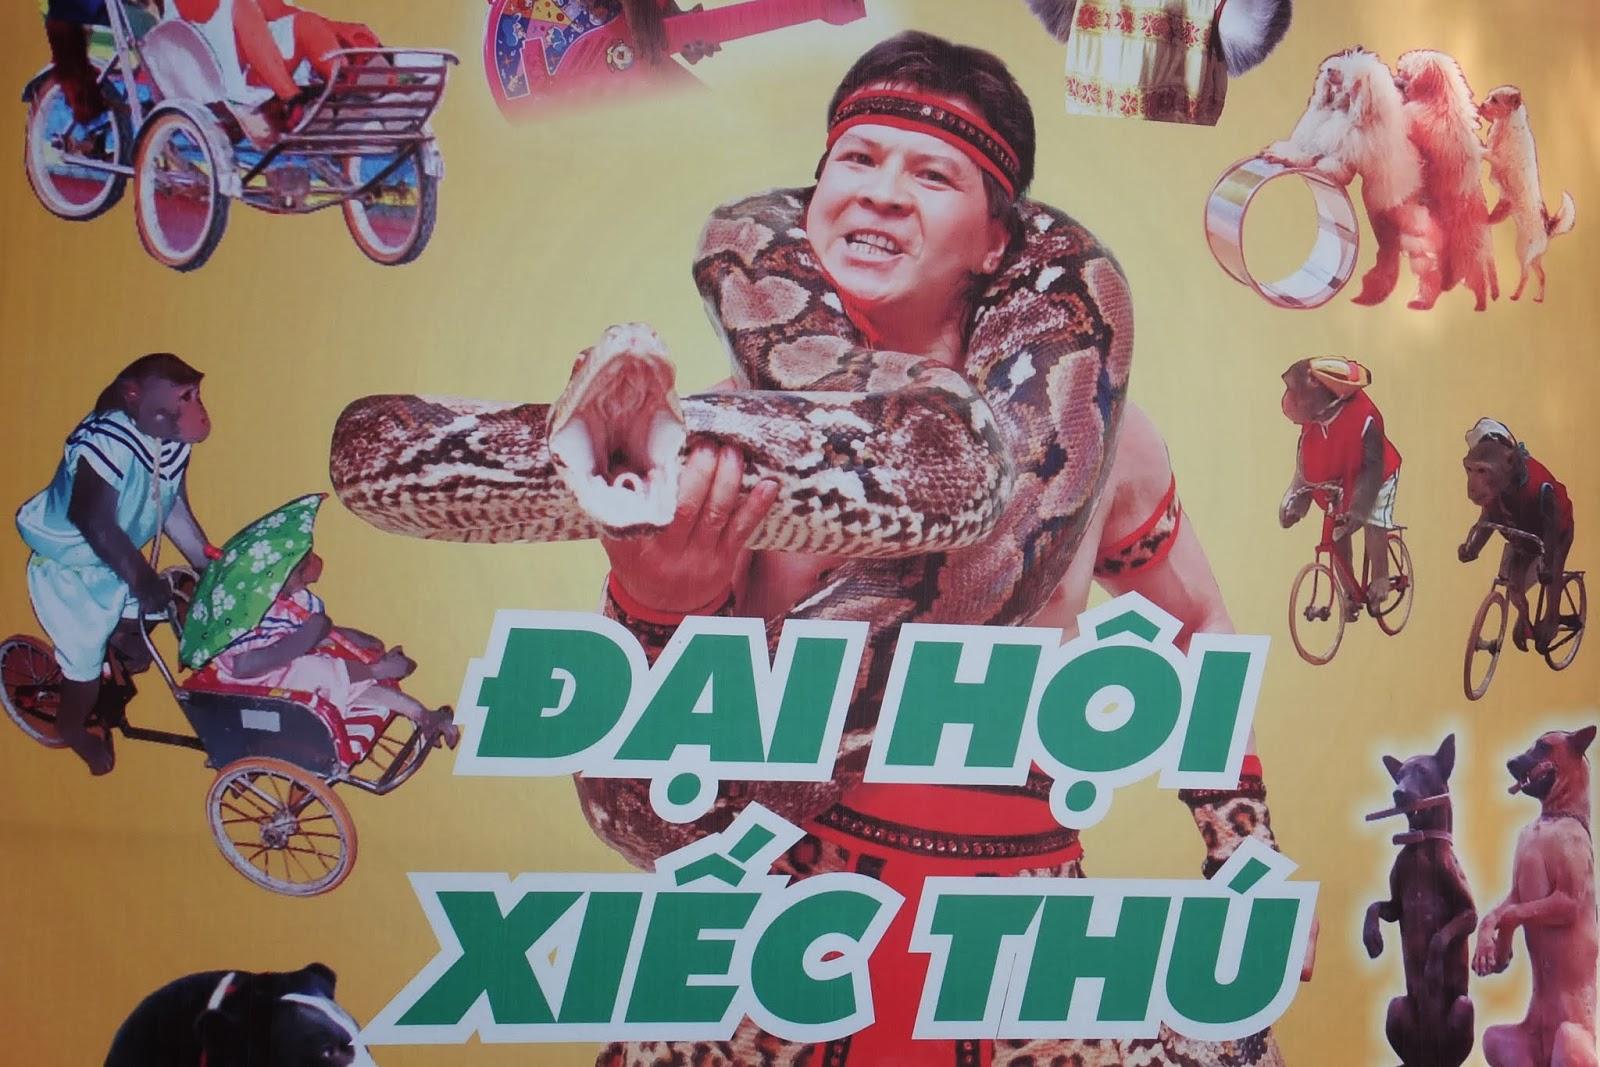 hanoi-circus-ad ハノイサーカス広告:蛇使い2